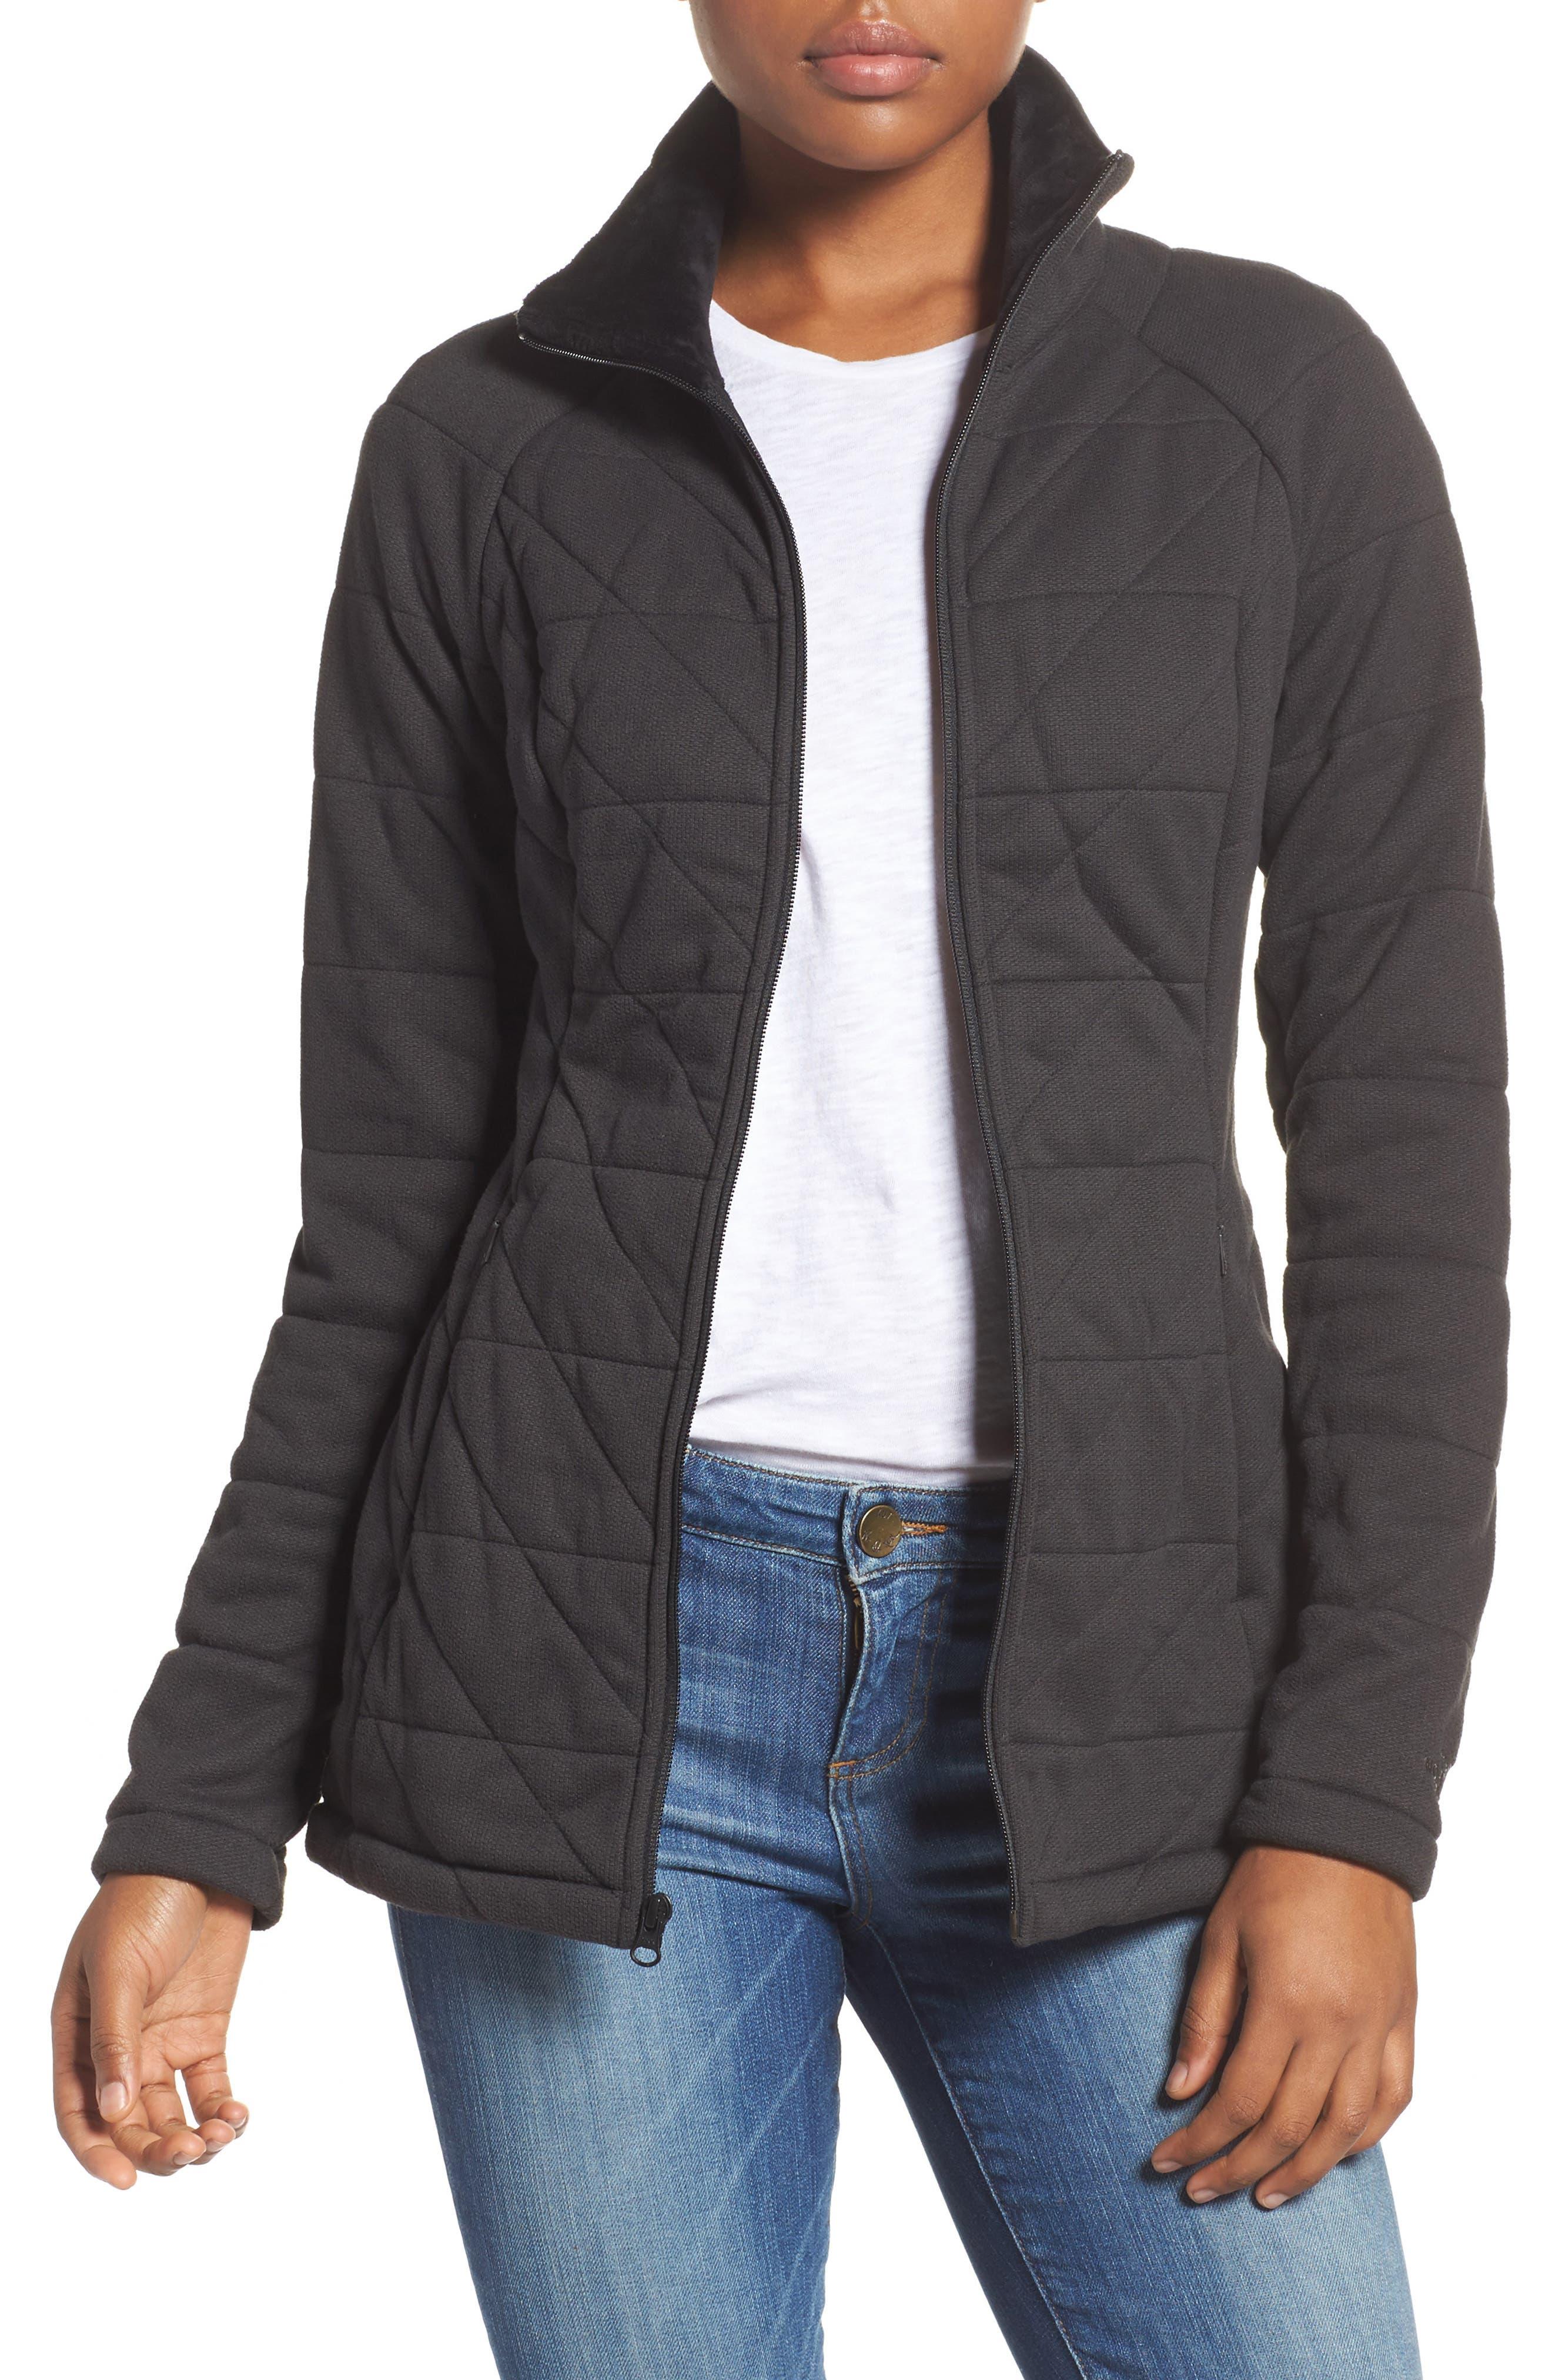 Main Image - The North Face Fleece Jacket